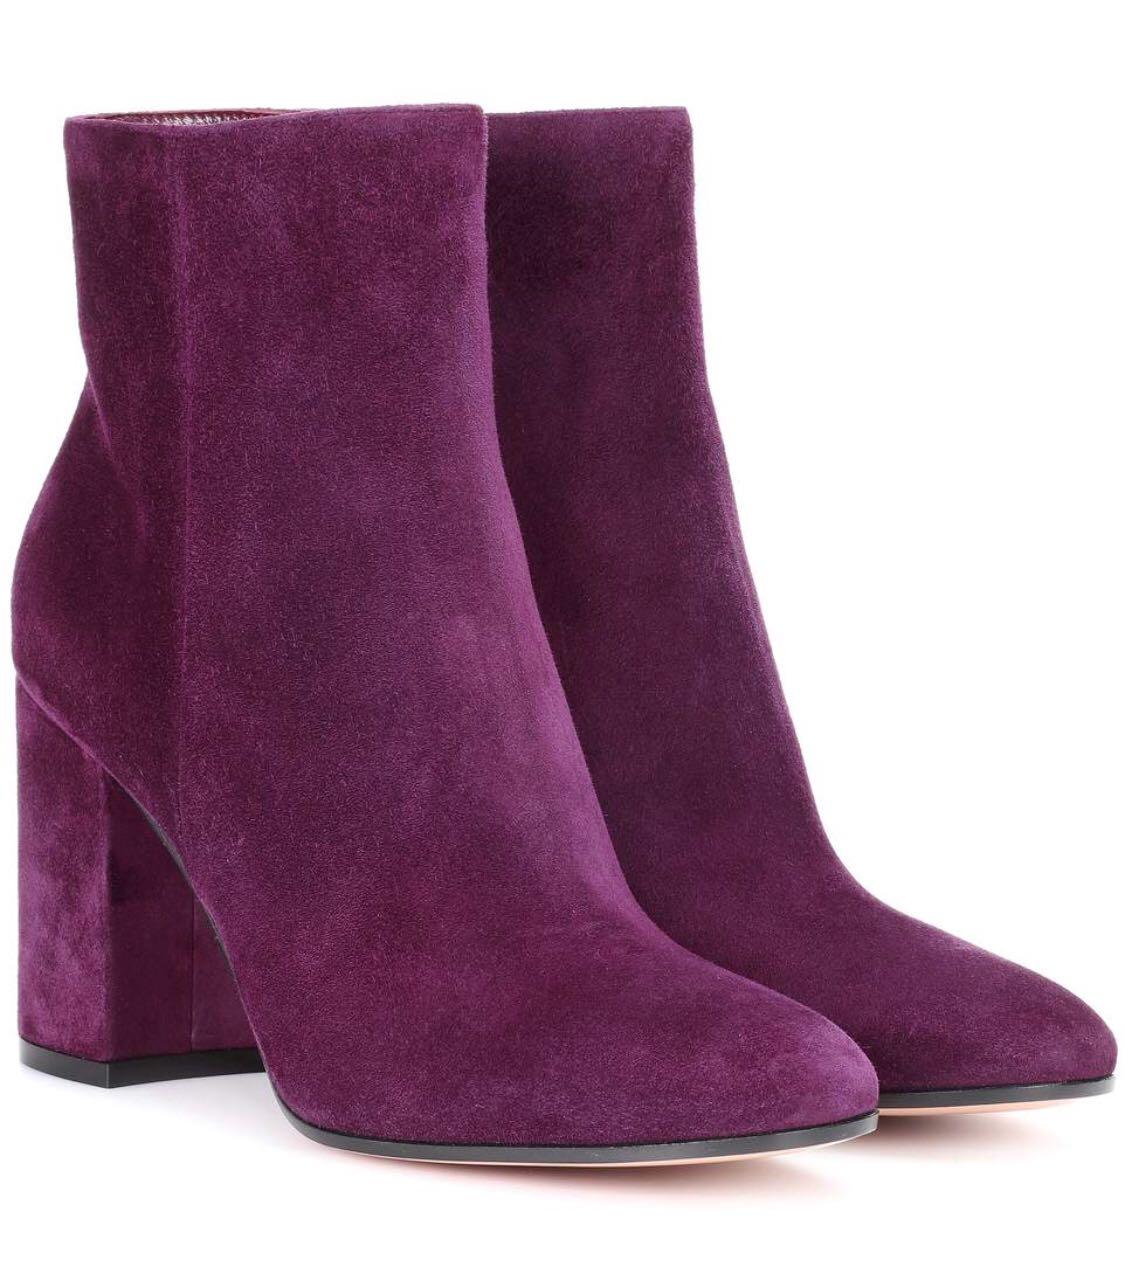 botines ultra violet personal shopper Elche